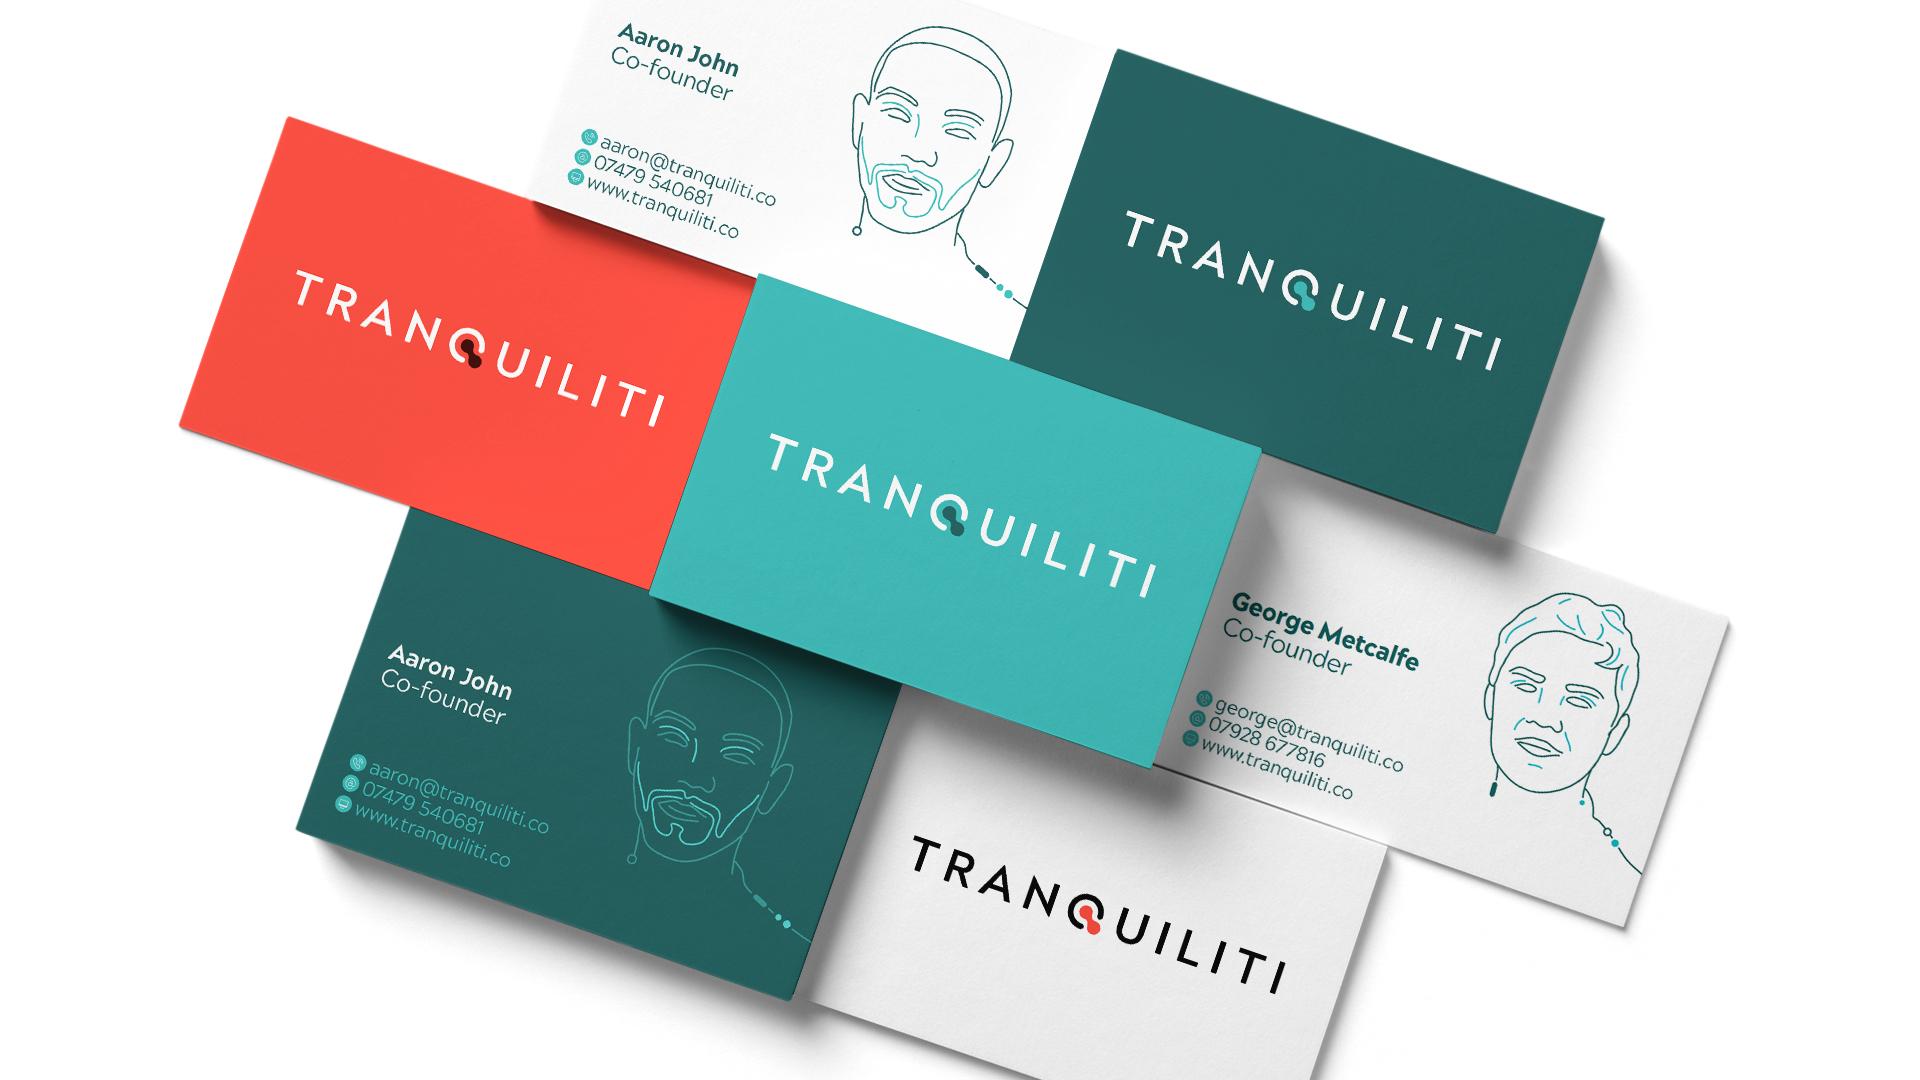 Image - Tranquiliti visual identity